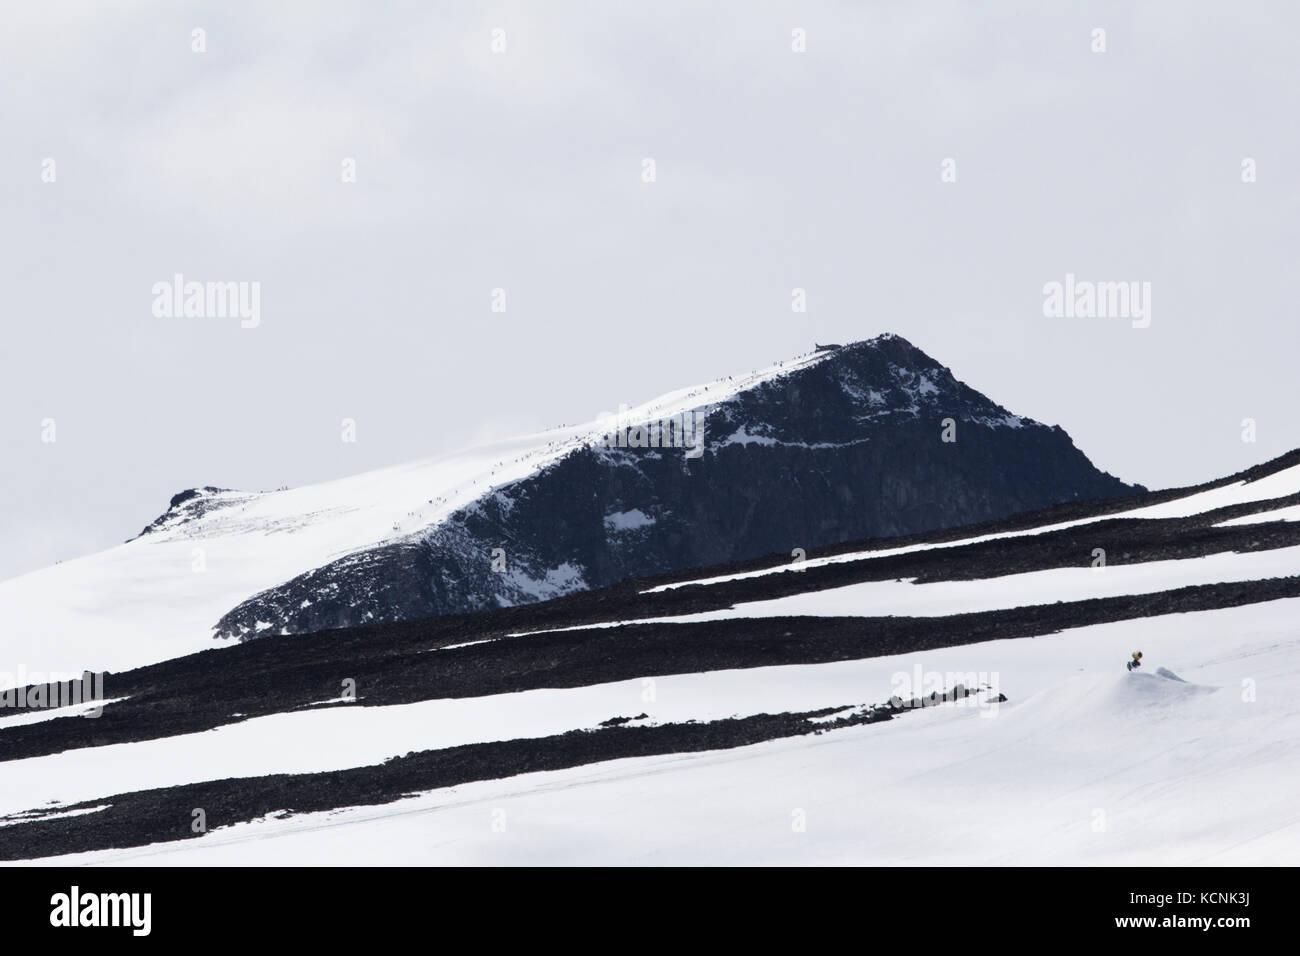 Galdhopiggen mountain in jotunheimen norway highest mountain in north europe - Stock Image